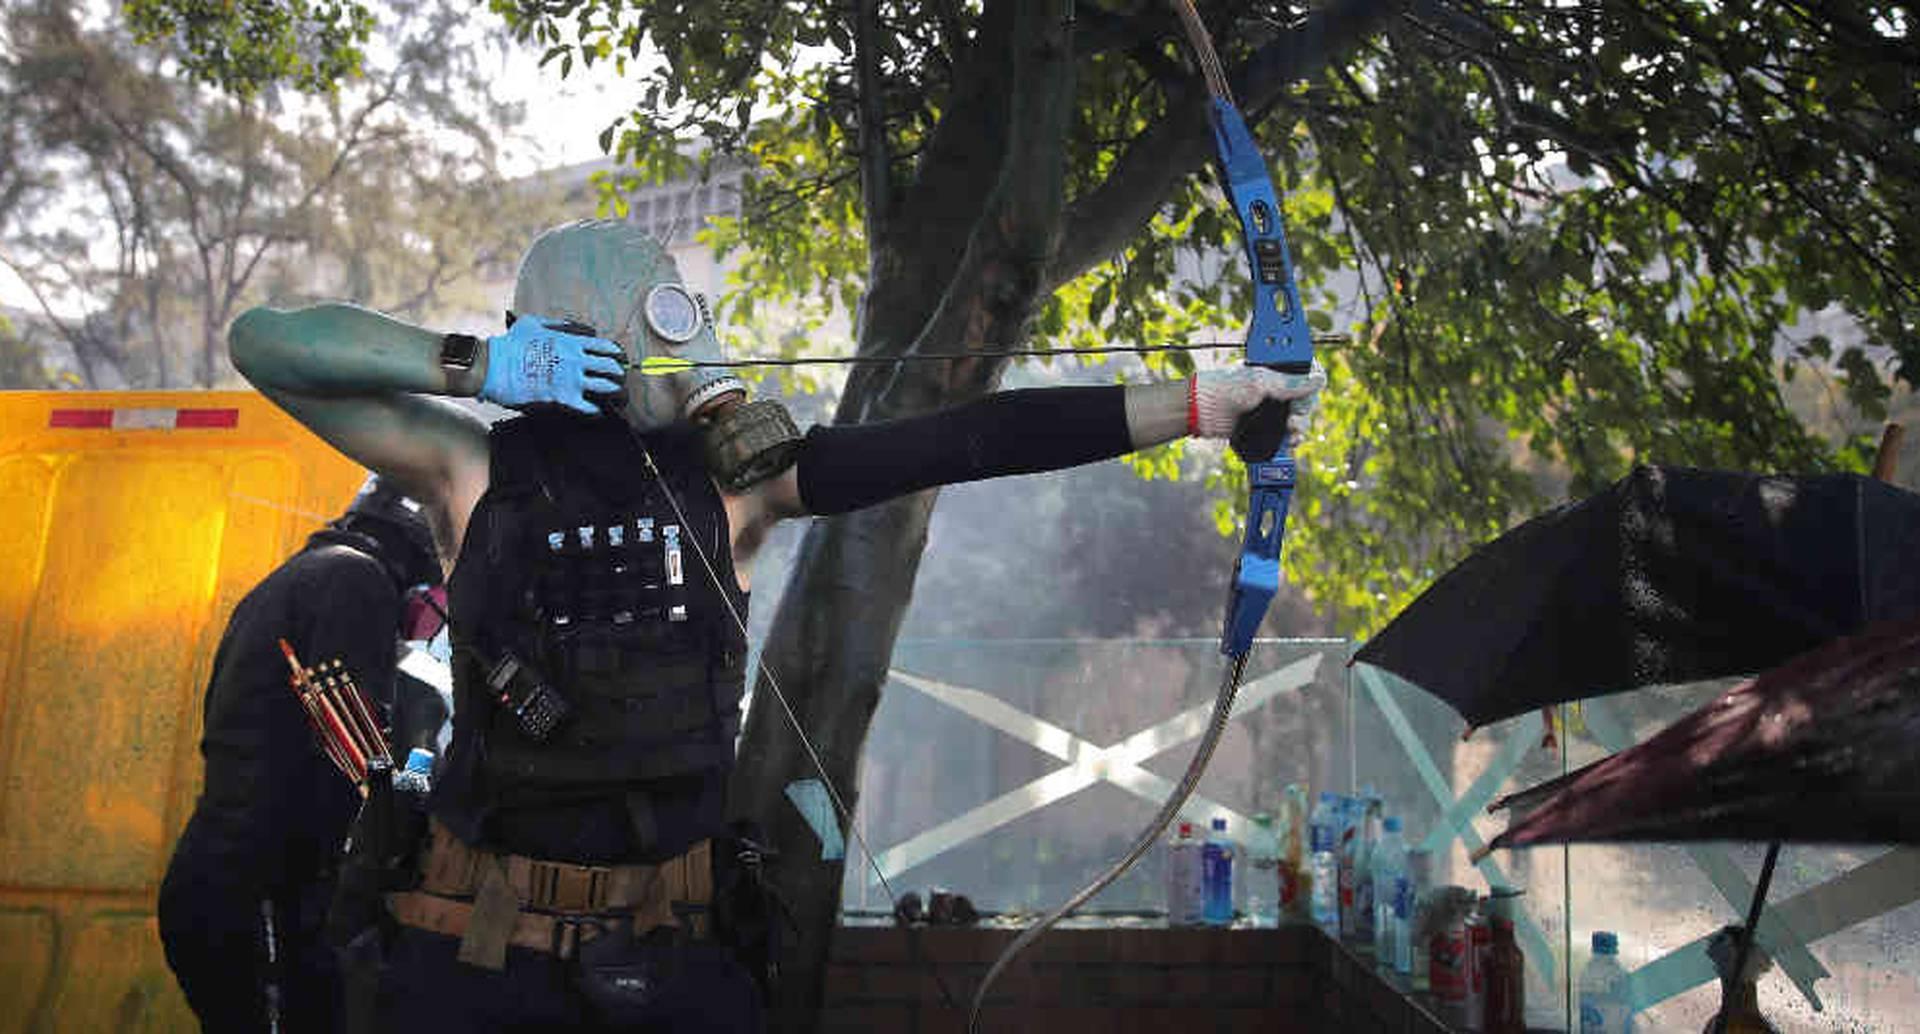 Un hombre se prepara para disparar una flecha contra la Fuerza pública de Hong Kong. La angustia se toma las calles de la ciudad. Foto: AP/Kin Cheung.